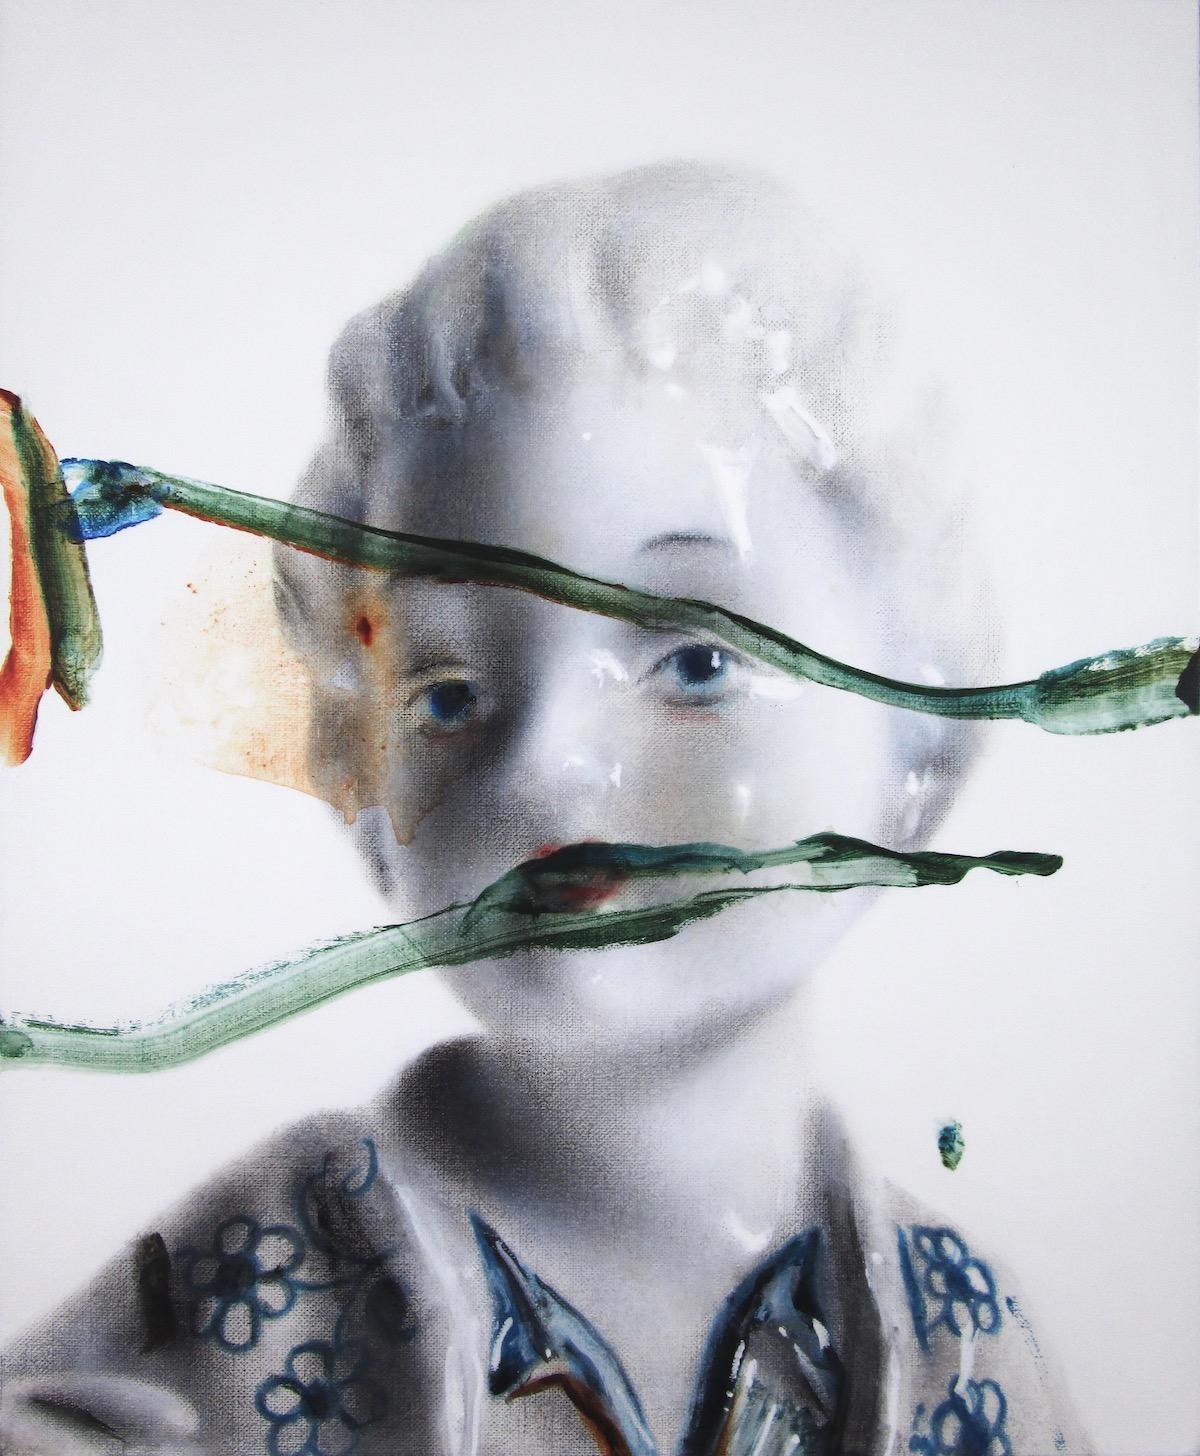 antoine cordet canvas toile peinture painting portrait art artist artiste peintre acrylic oil